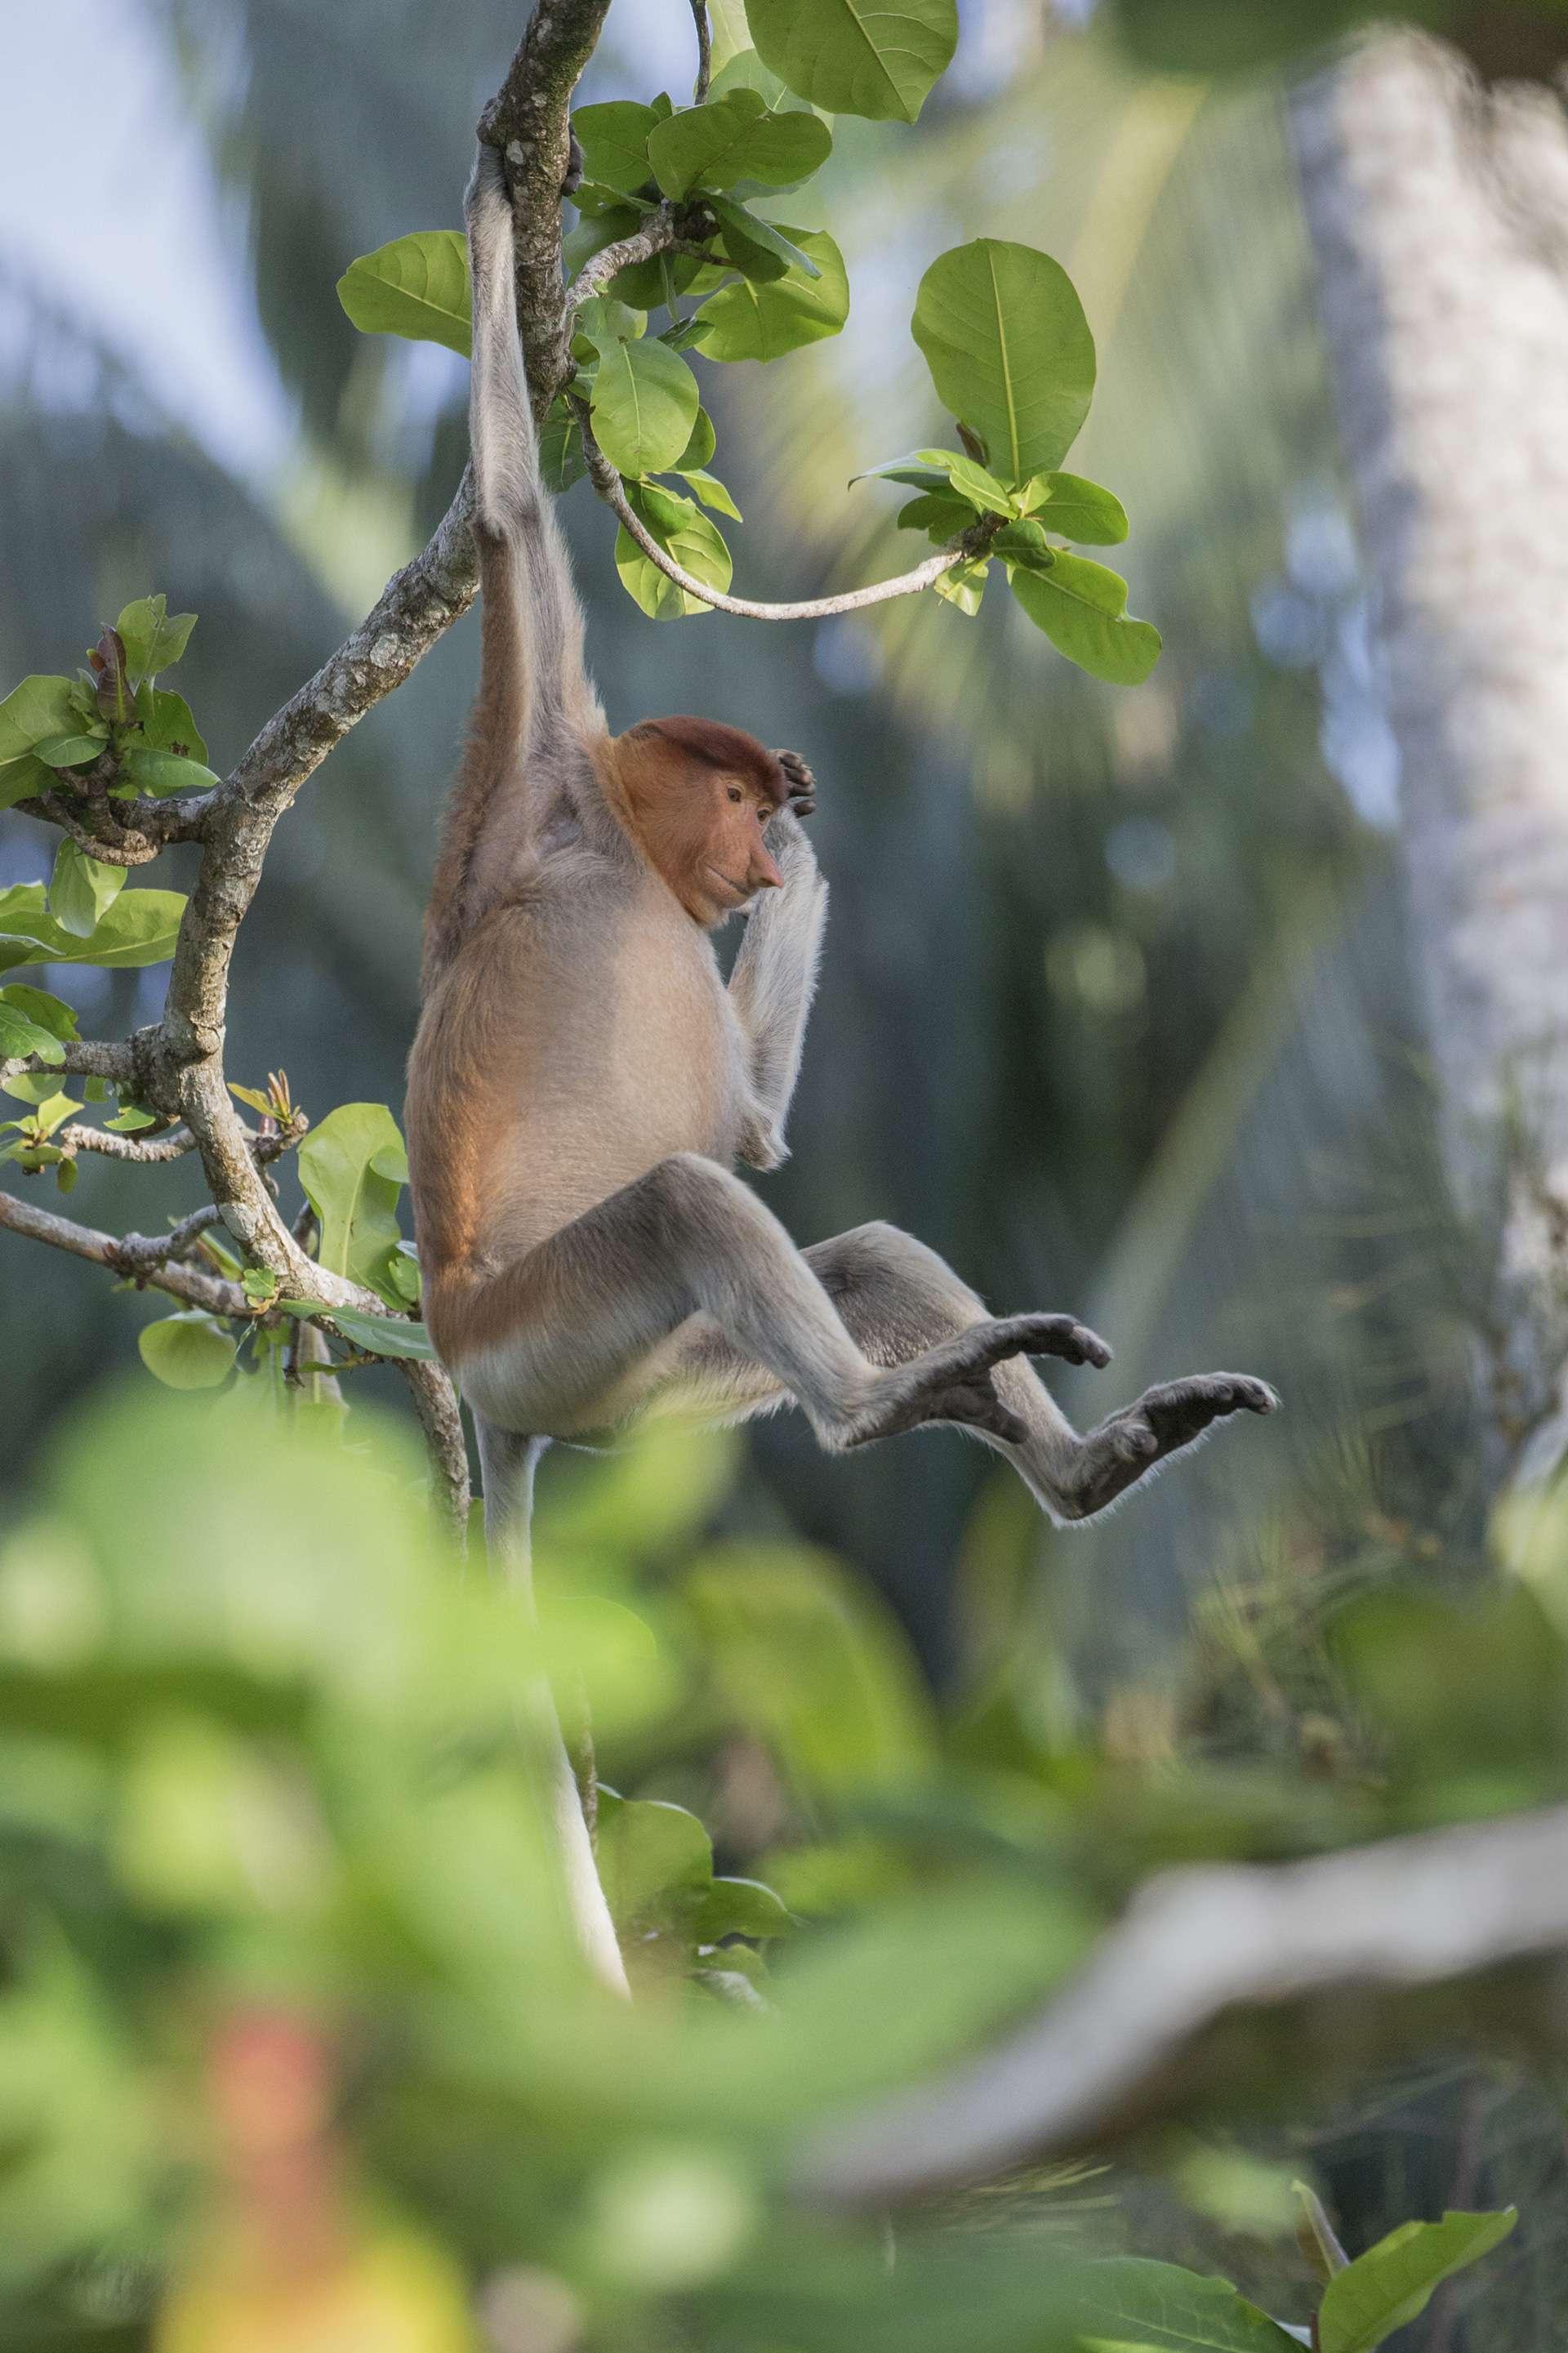 Gilles Martin's photograph of a proboscis monkey (nasalis larvatus) from Borneo